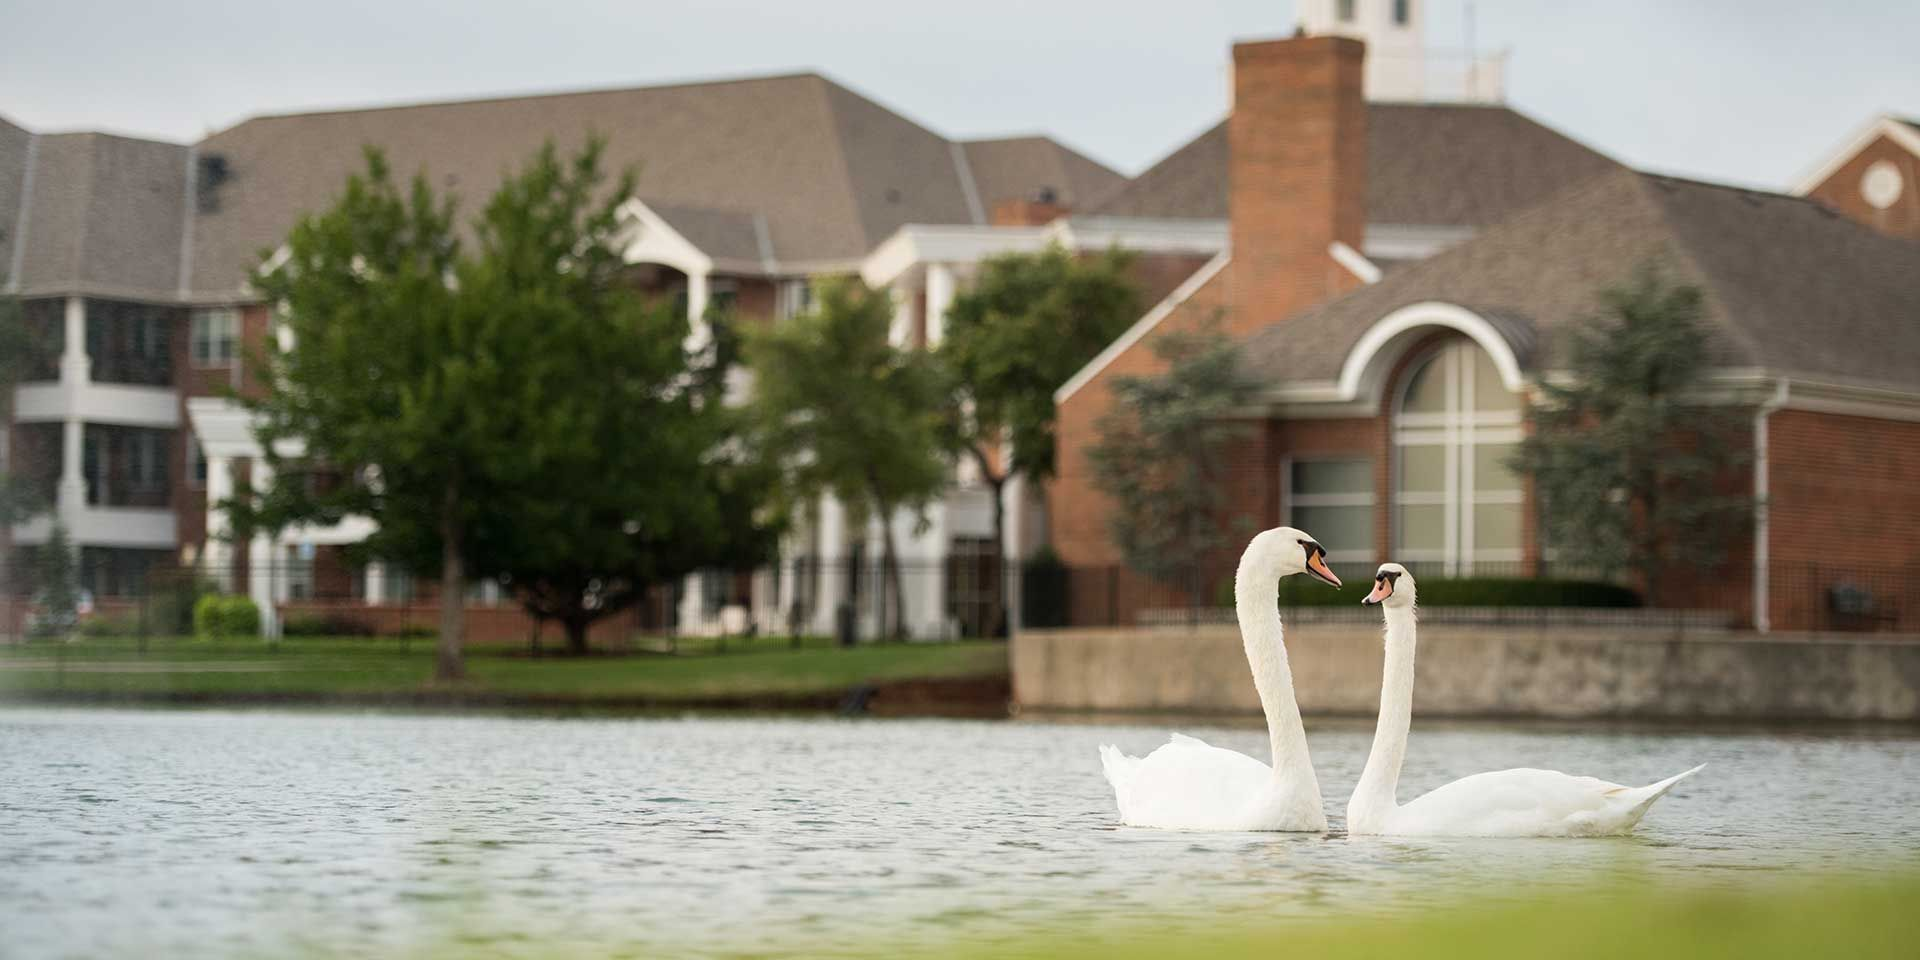 About Epworth Villa Retirement Community Nursing home